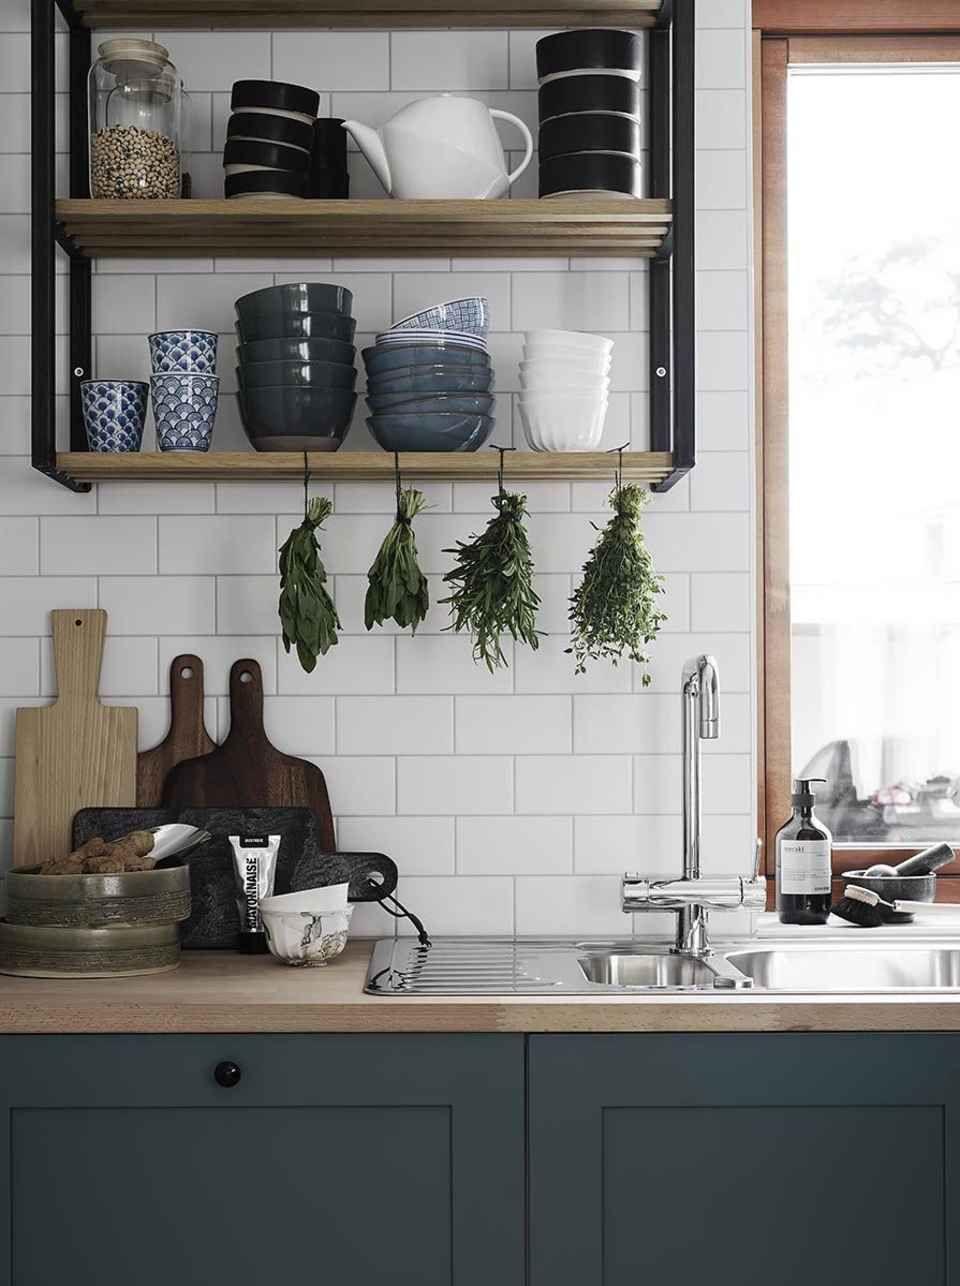 50 Examples Of Beautiful Scandinavian Interior Design Kitchen Interior Interior Design Kitchen Kitchen Decor